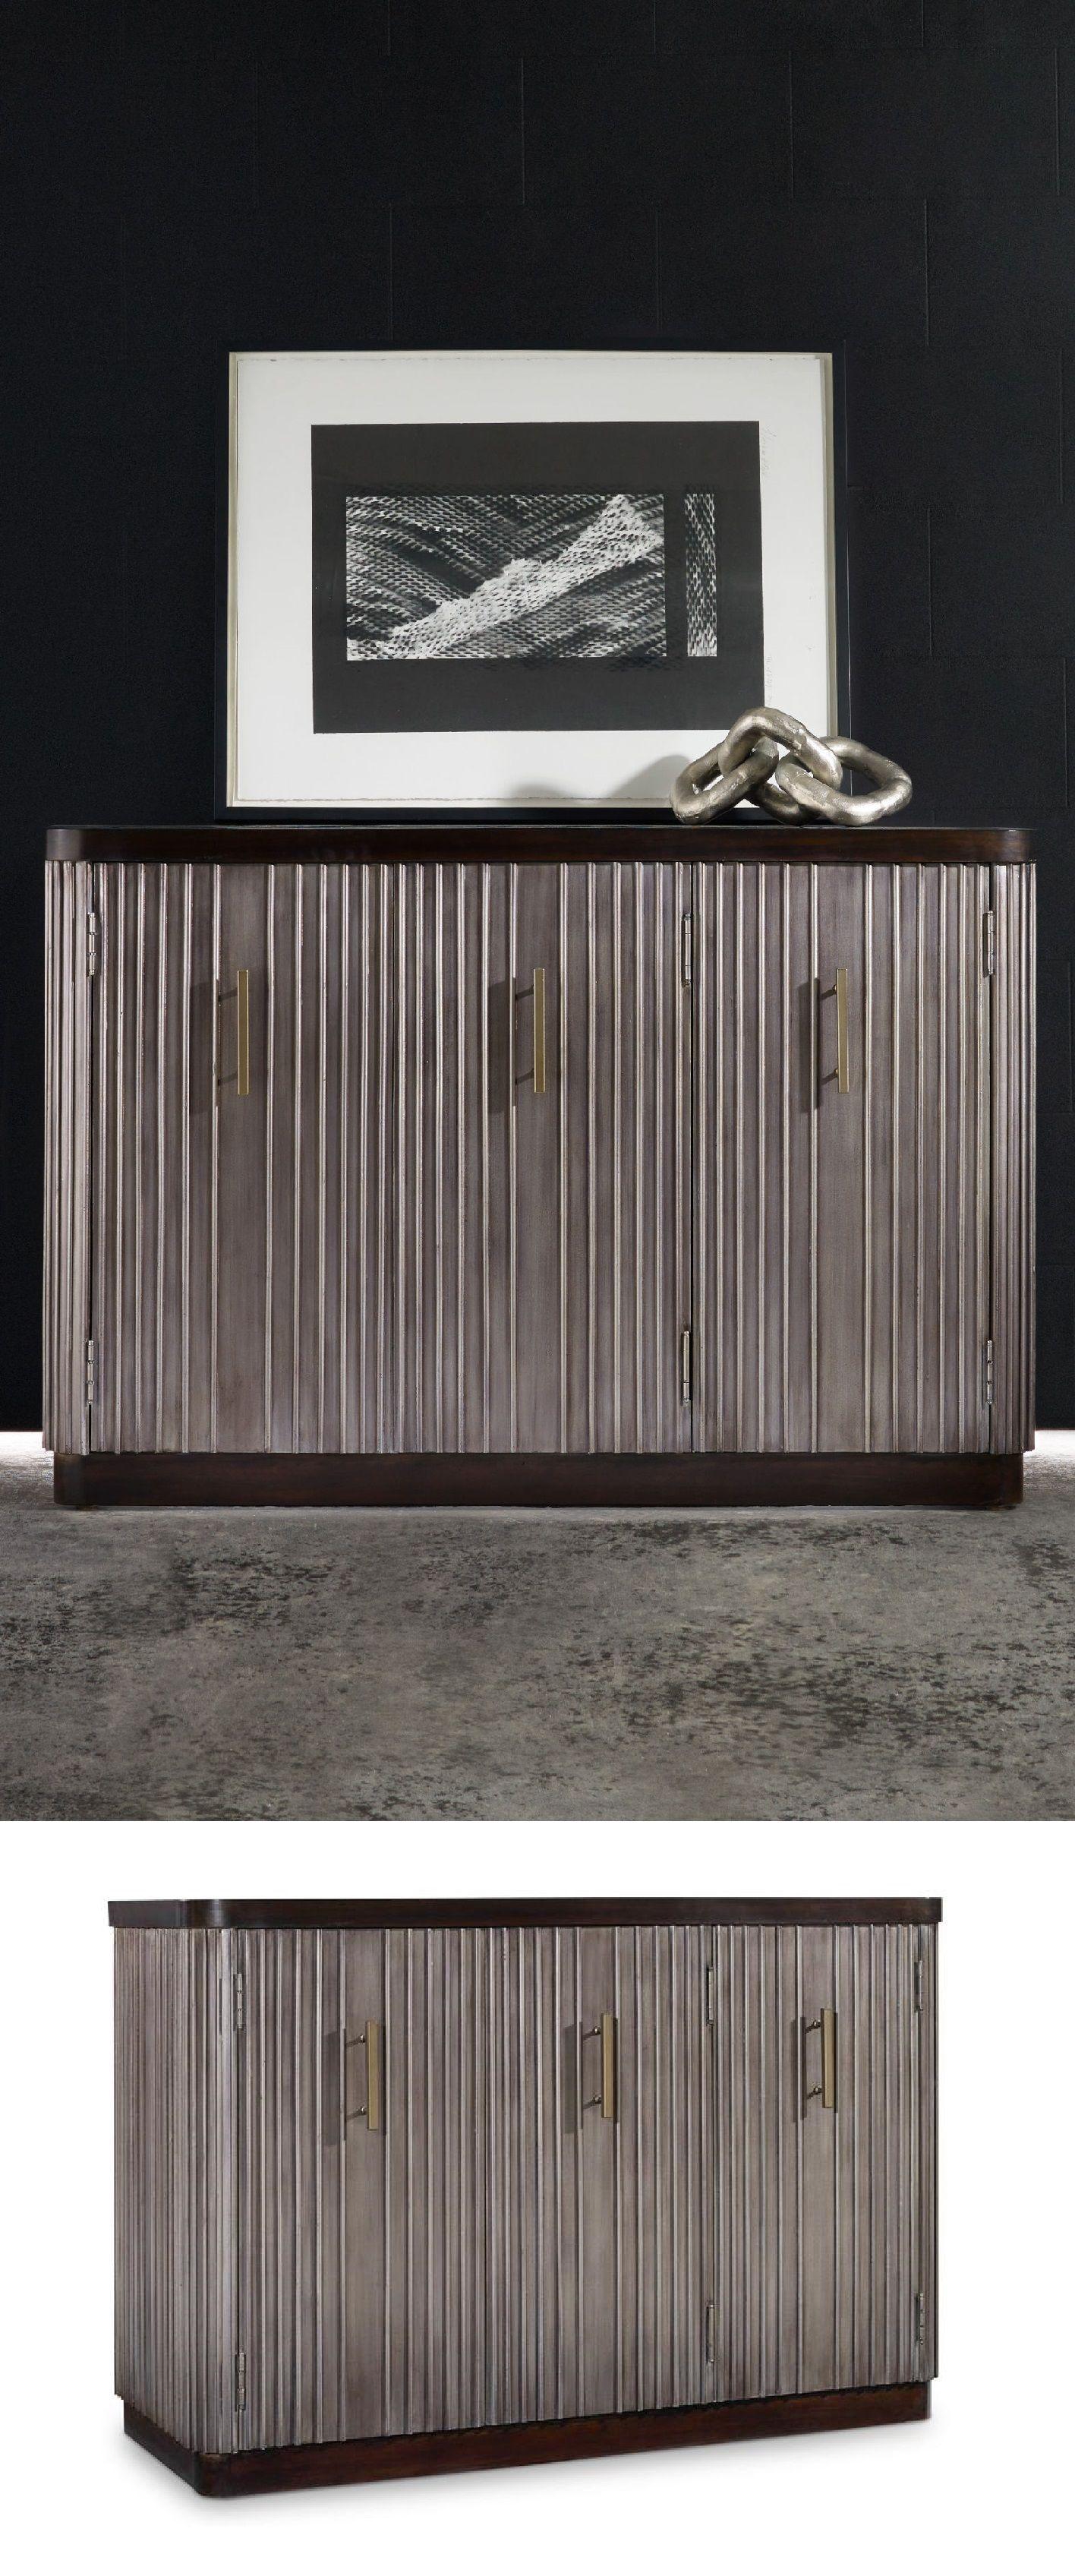 Buffet - Buffets - Buffet Furniture - Sideboard - Sideboards